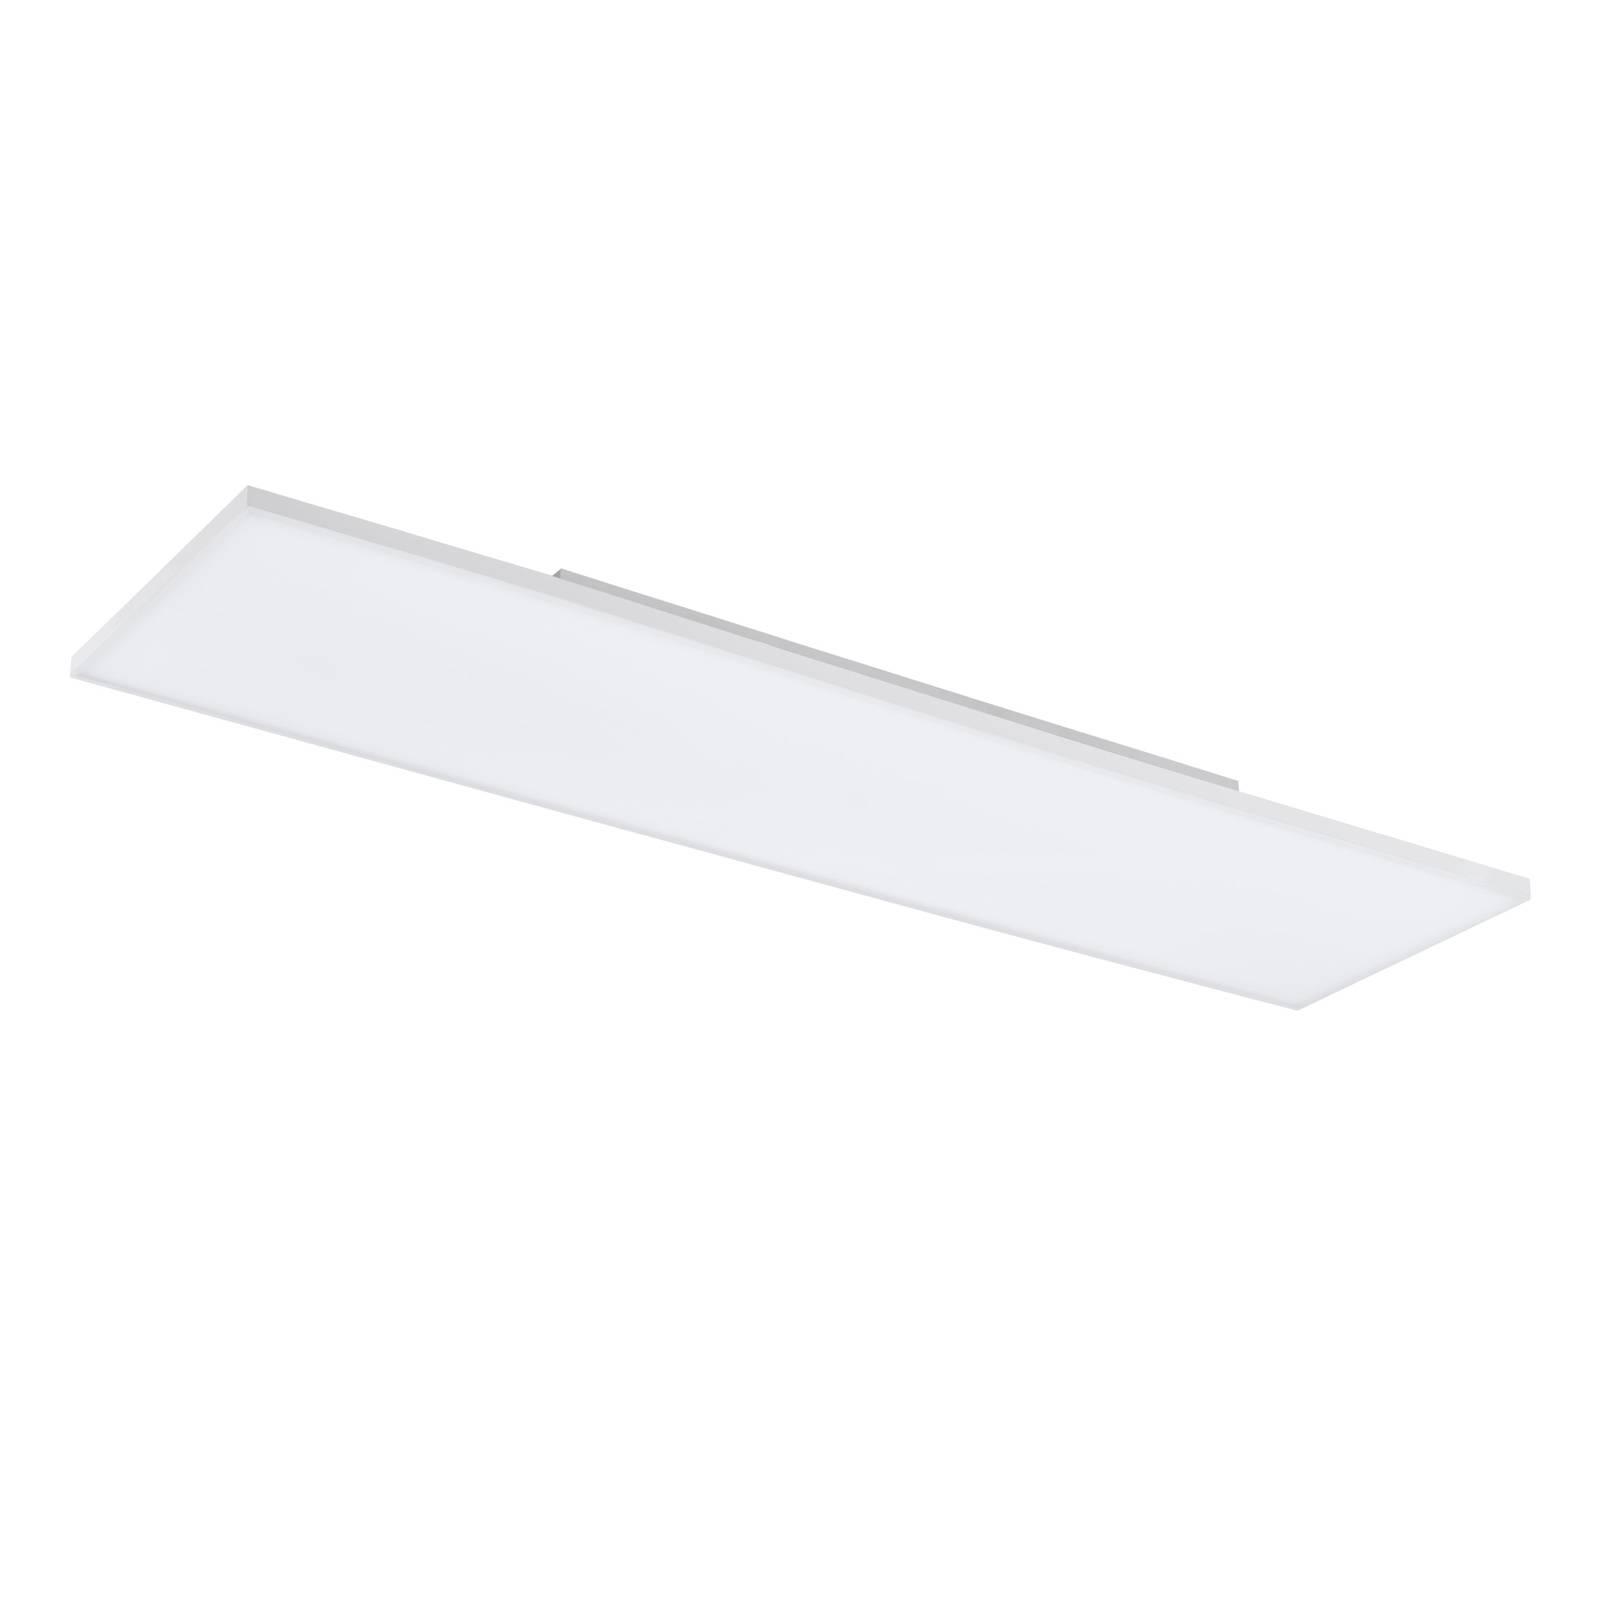 Plafoniera LED Turcona, 120 x 30 cm